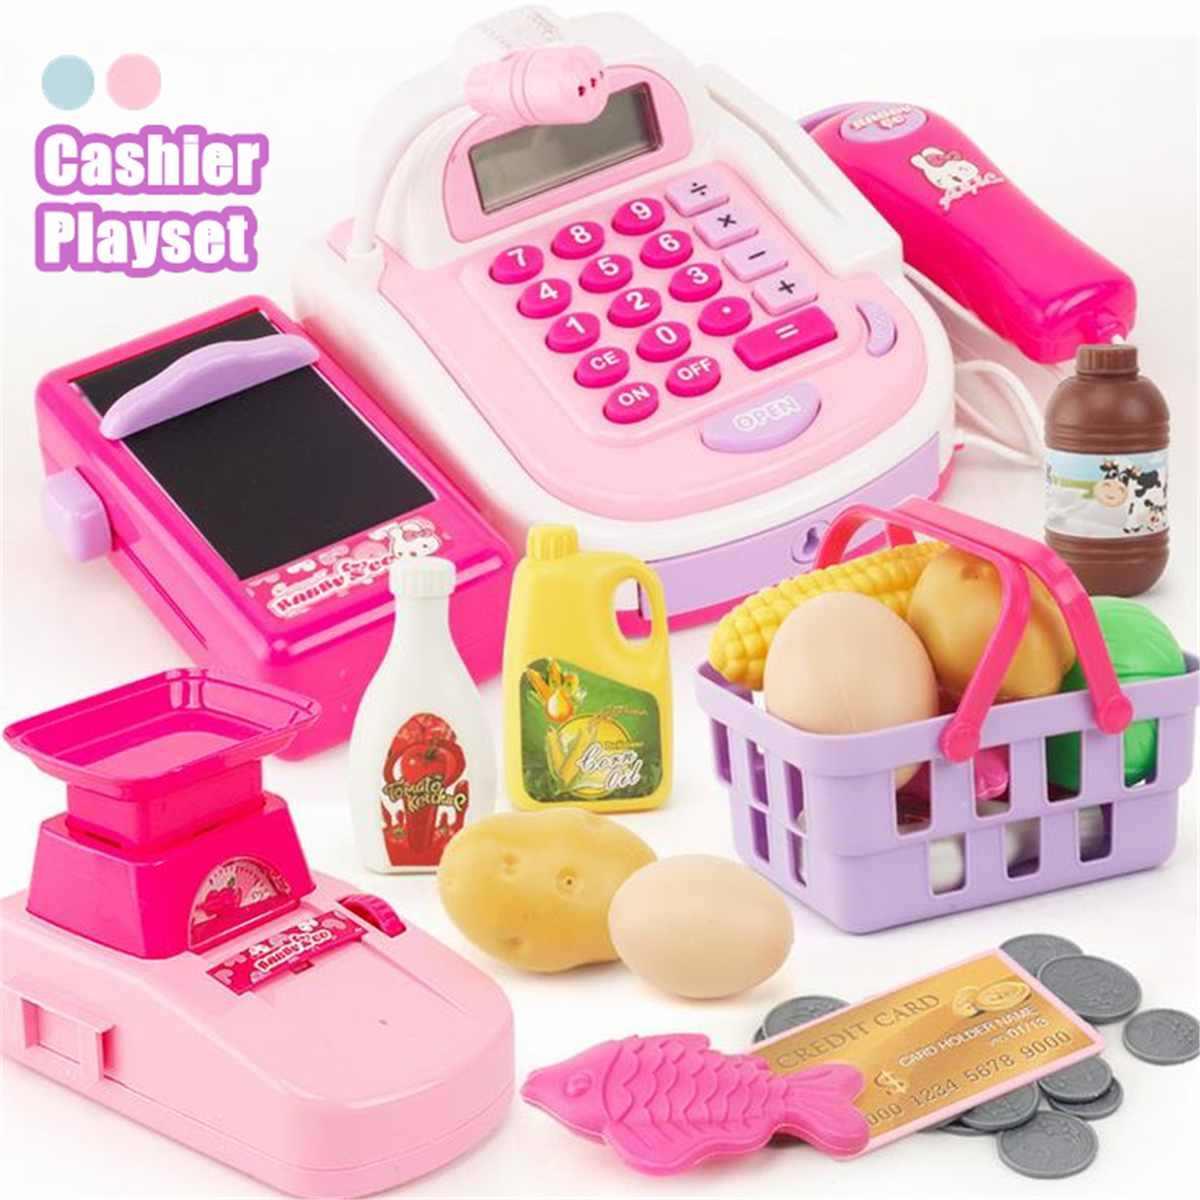 Plastic Mini Gesimuleerde Supermarkt Kassa Rol Kids Kassa Kassier Pretend Play Kinderen Vroege Educatief Speelgoed